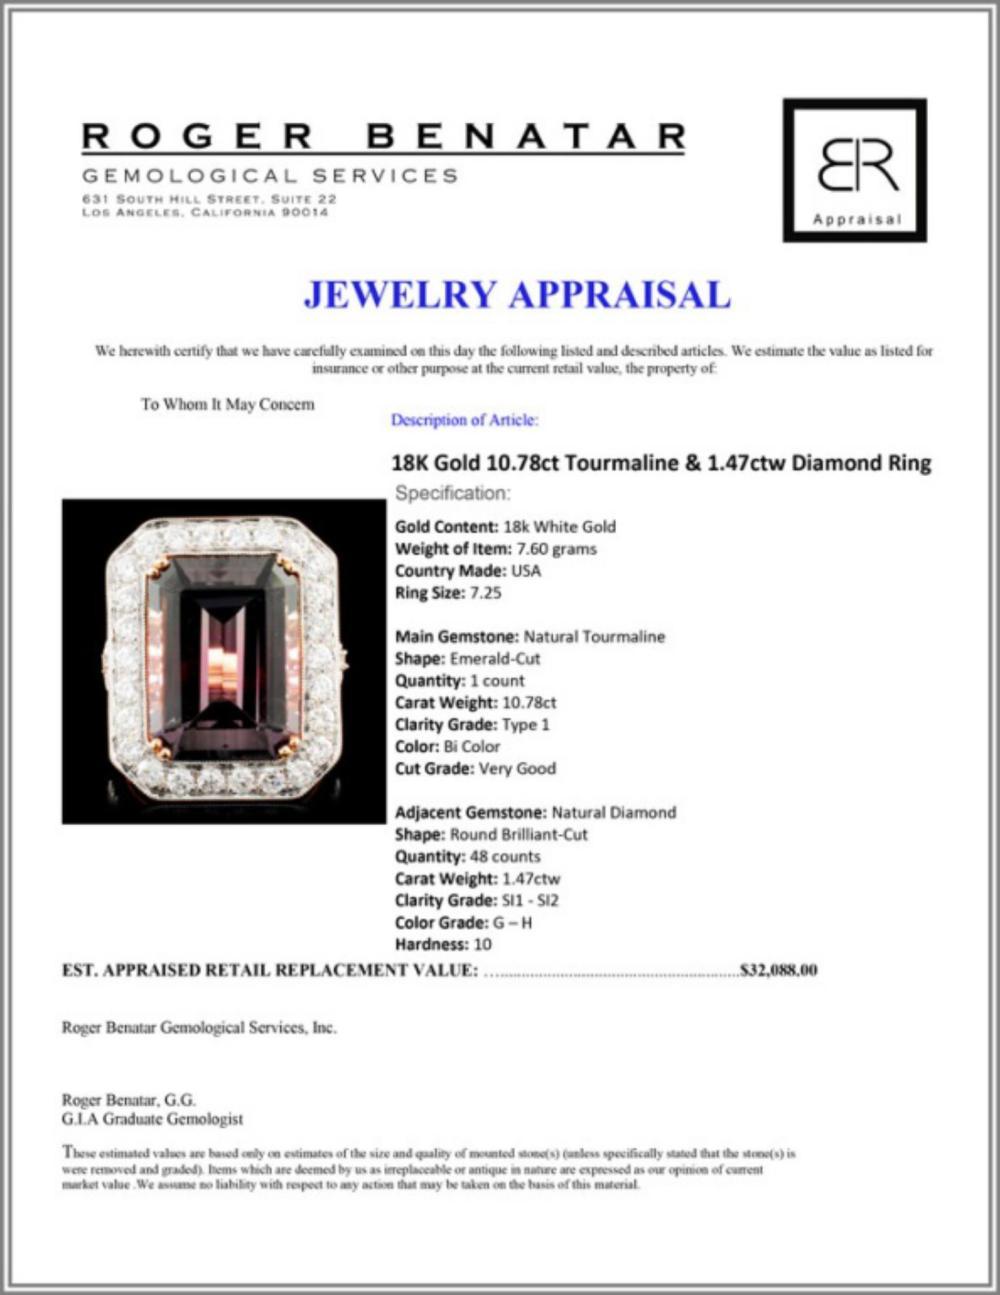 Lot 147: 18K Gold 10.78ct Tourmaline & 1.47ctw Diamond Ring